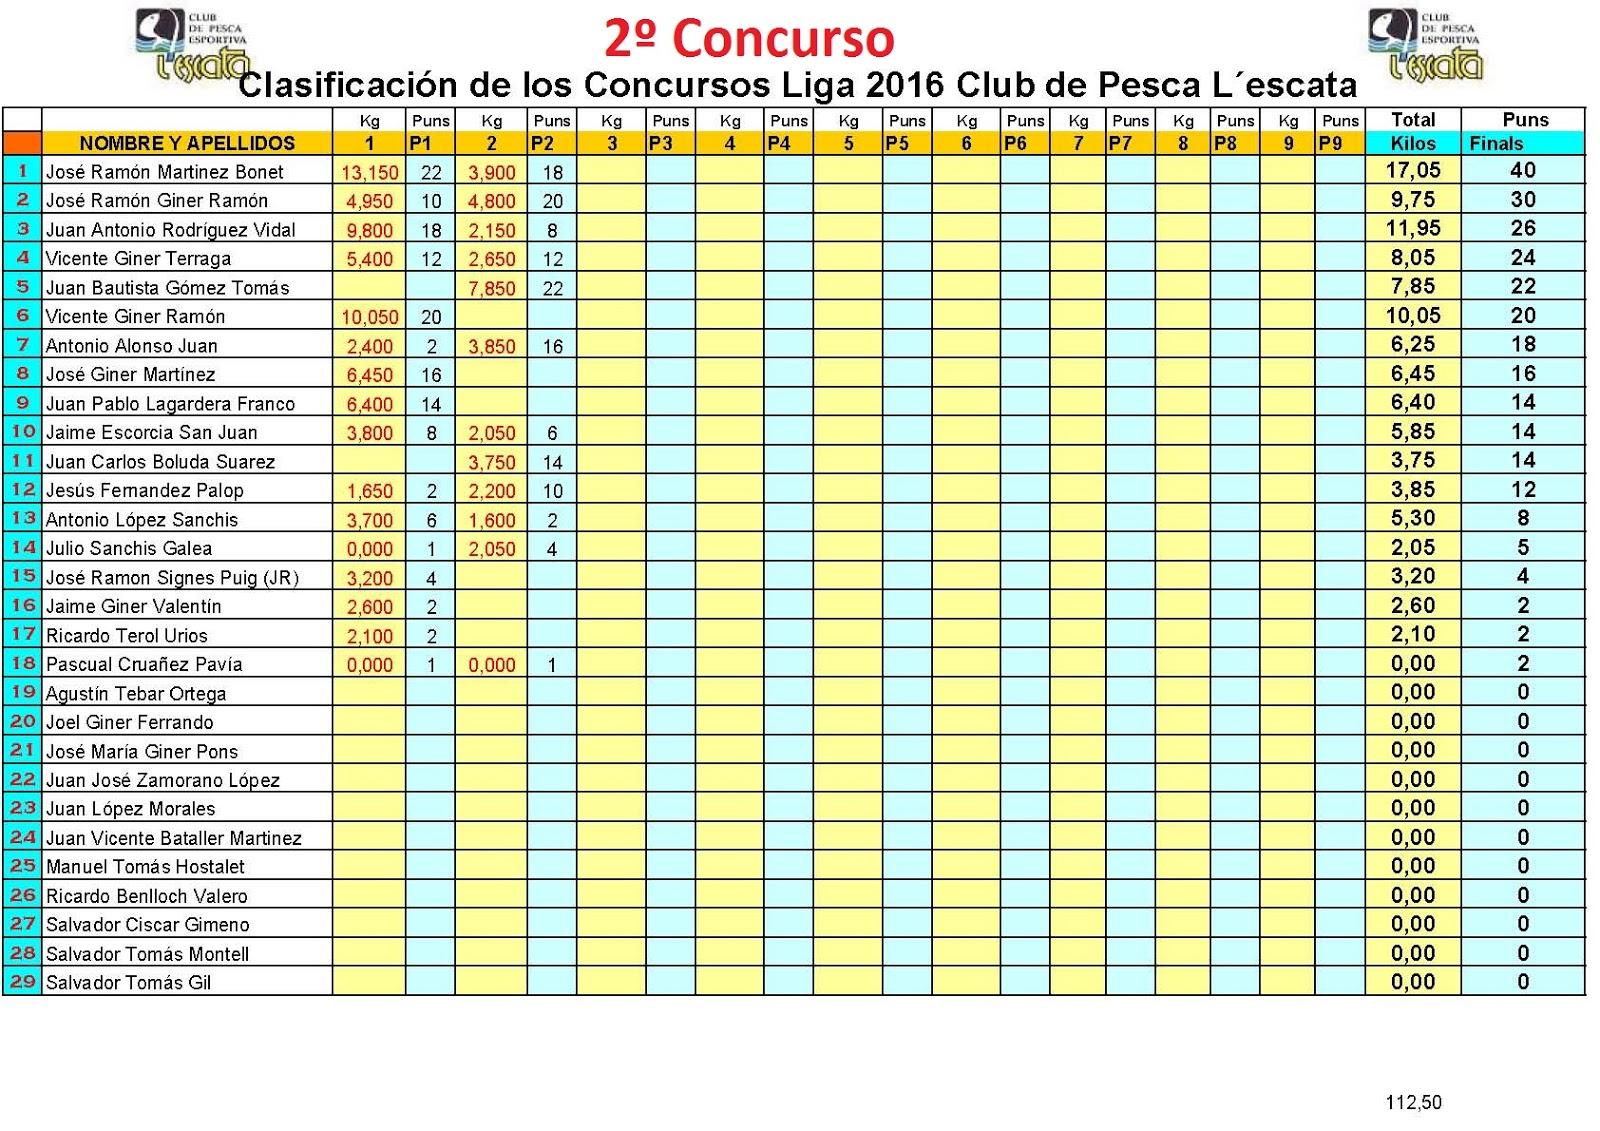 Club de pesca l escata clasificaci n concursos liga 2016 for Concurso de docencia 2016